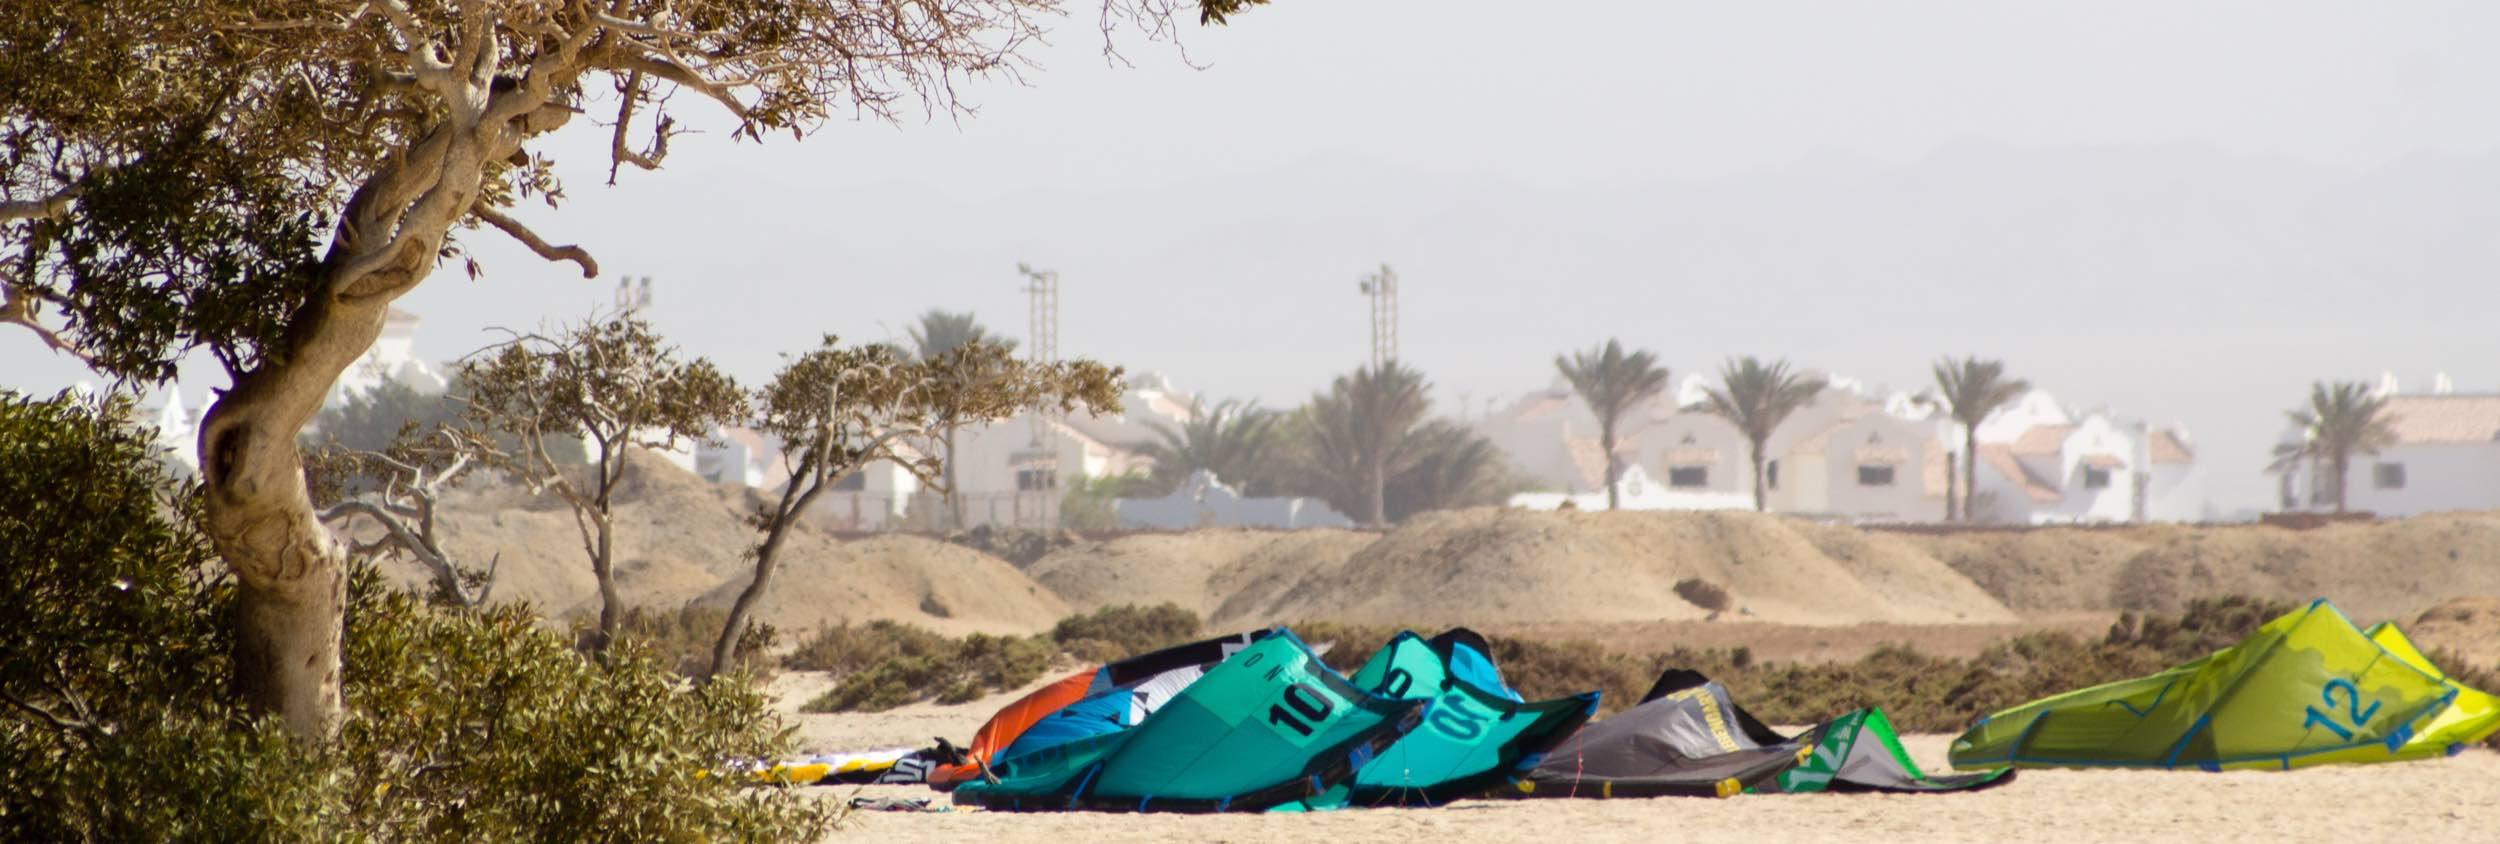 Wadi Lahami remote kite spot